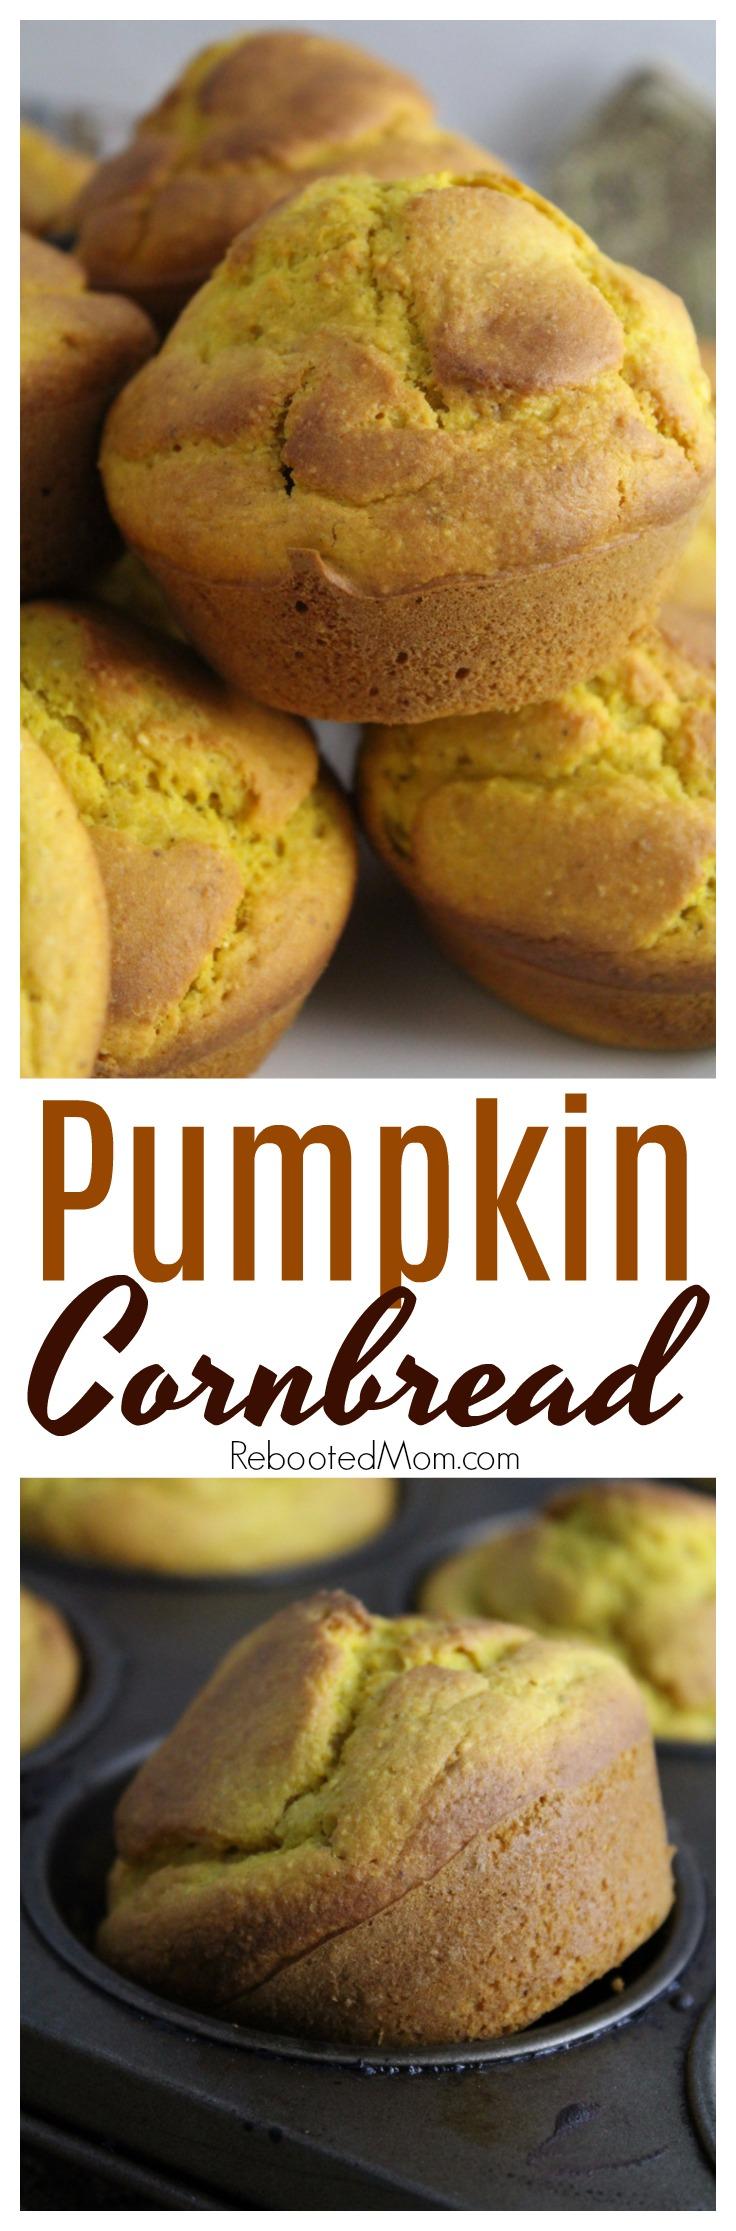 Put a delicious autumn spin on traditional cornbread with these pumpkin cornbread muffins.  #pumpkin #cornbread